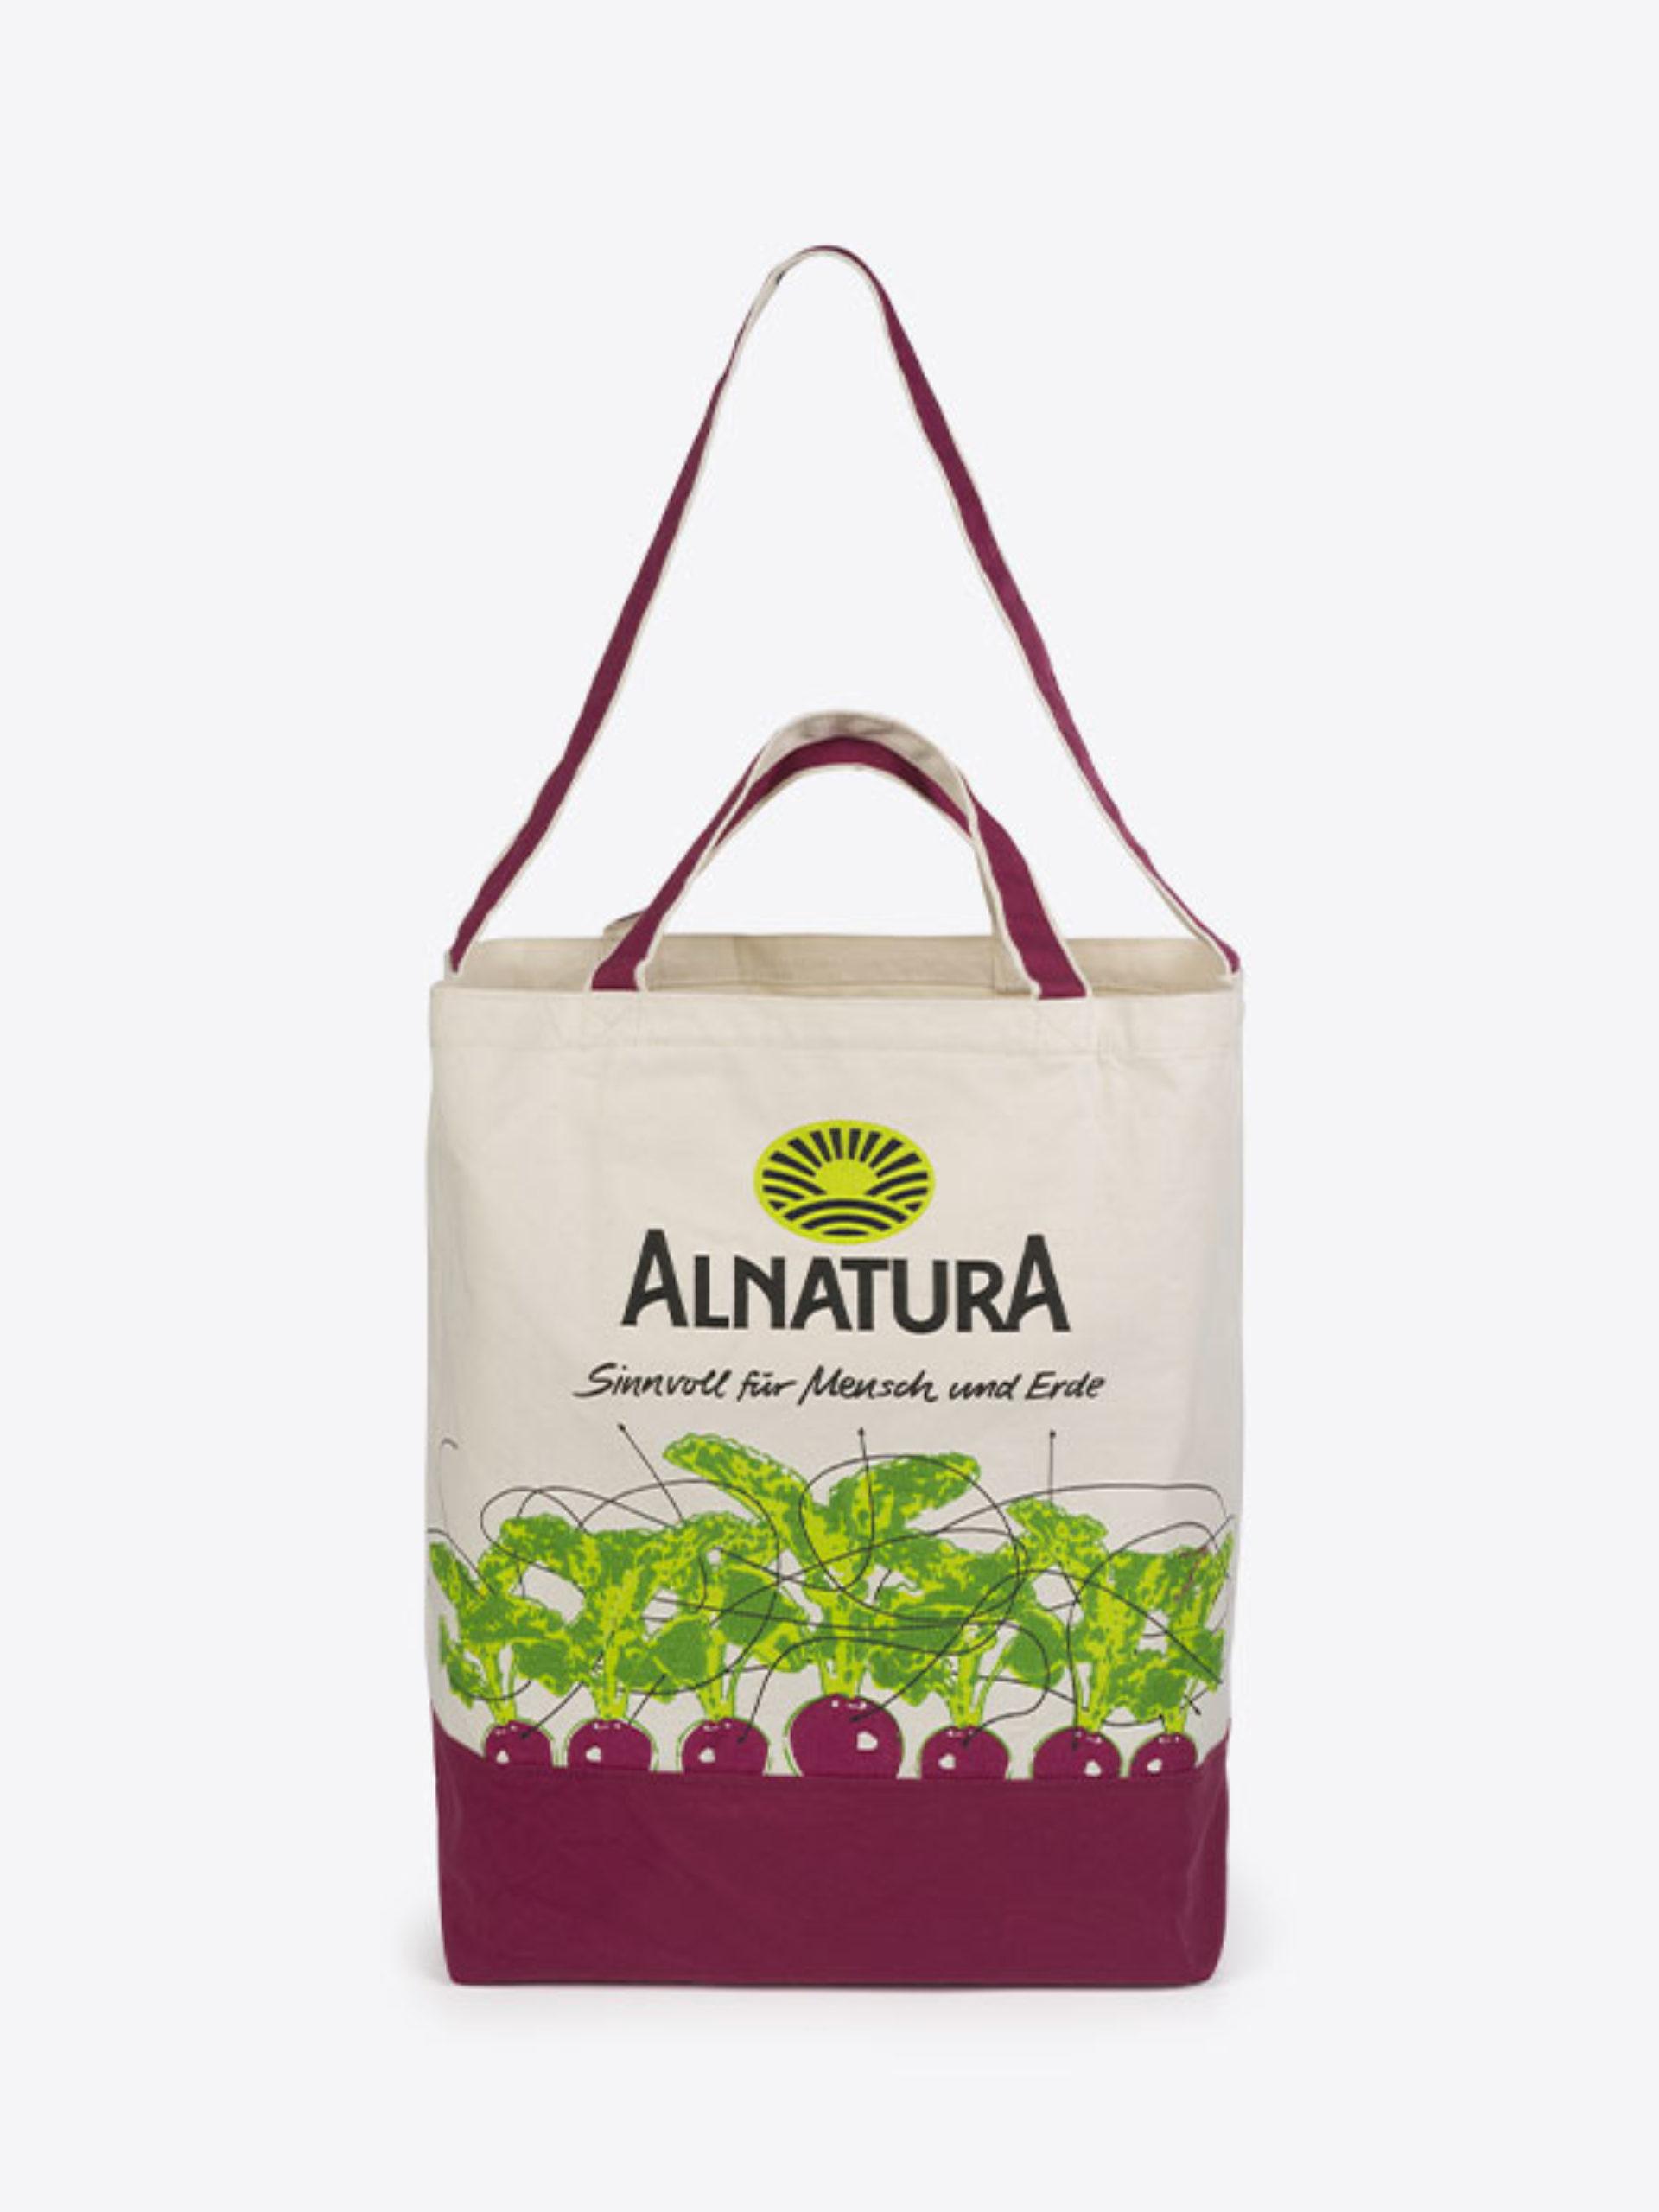 Tasche City Shopping Bag Mit Langen Henkel Bedrucken